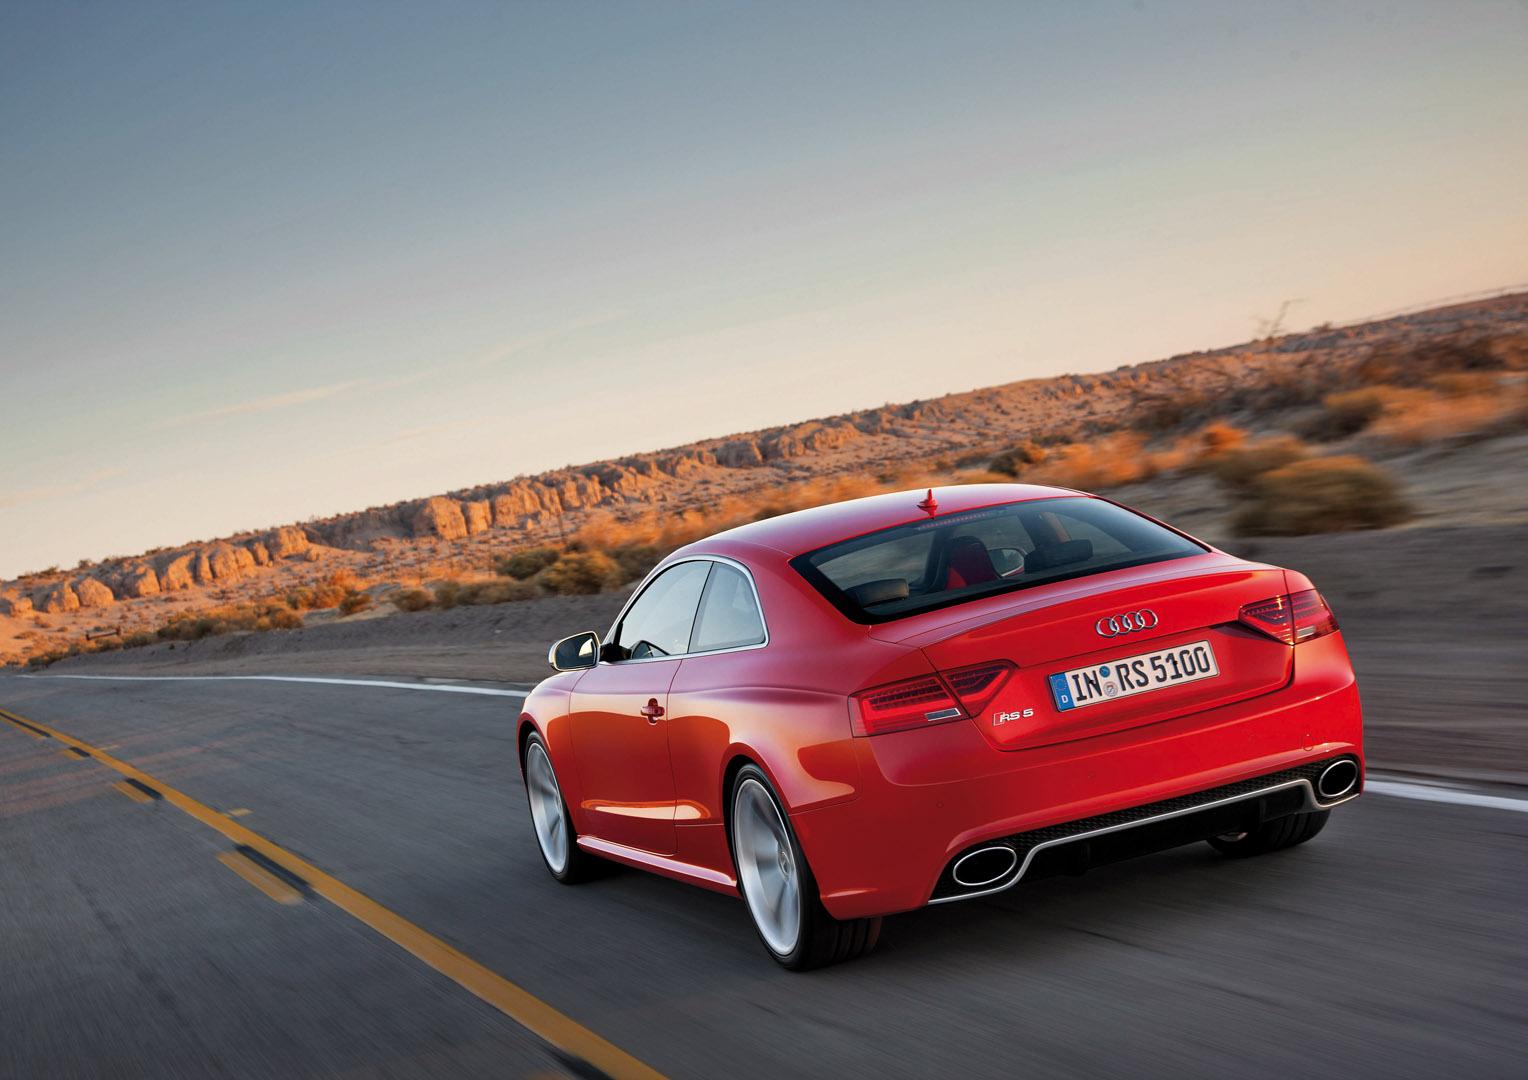 2013 Audi Rs 5 Image 20